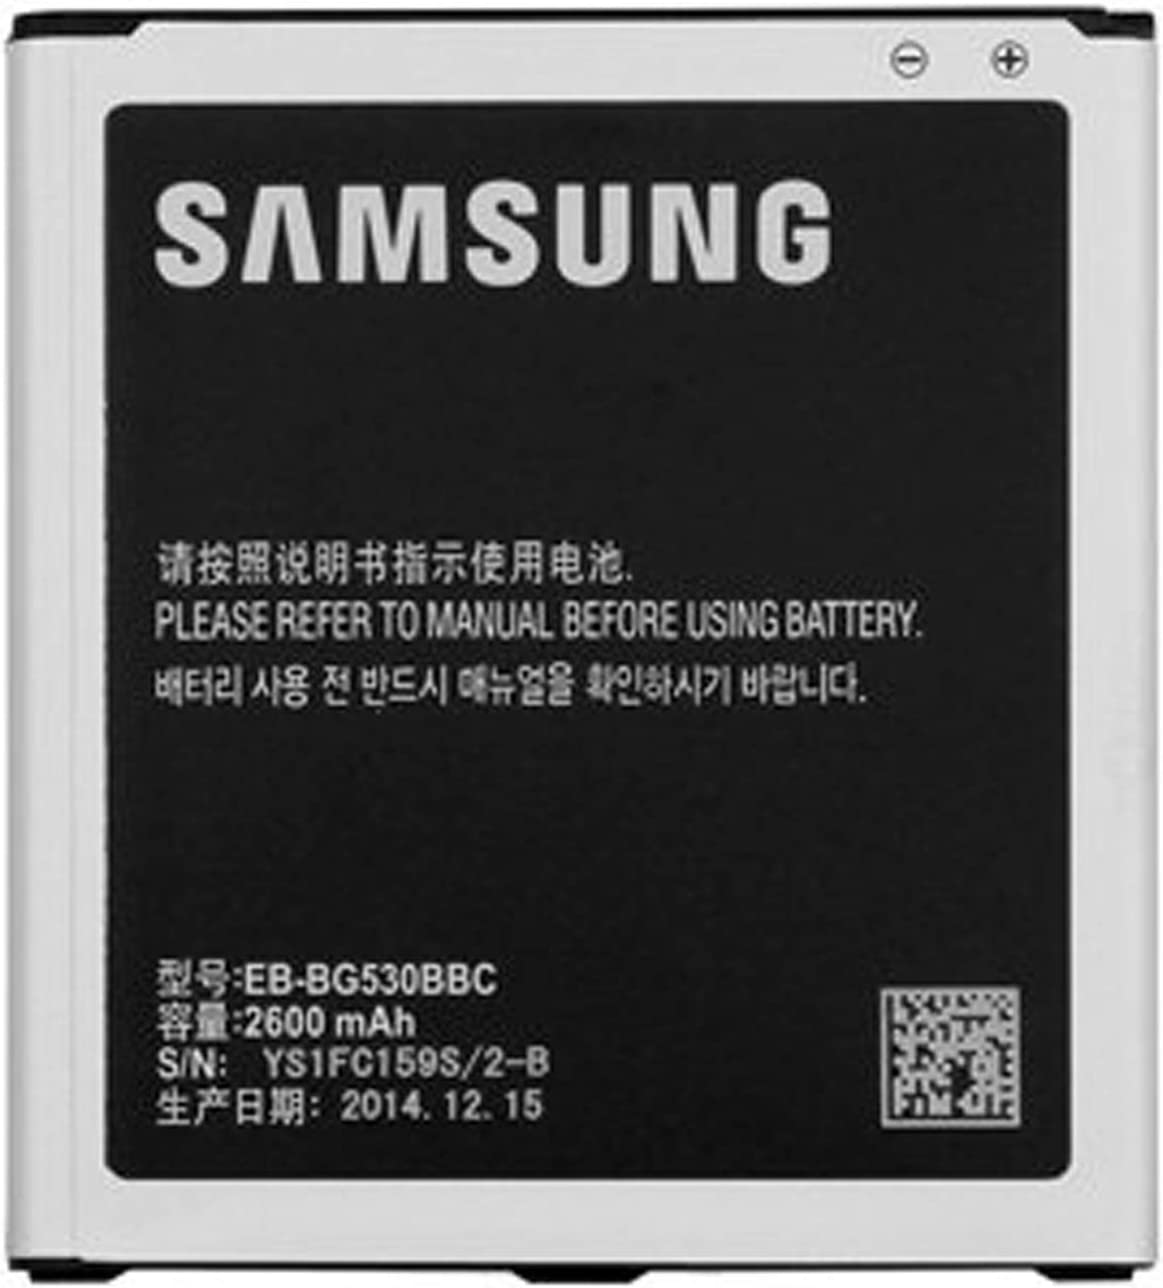 Samsung EB-BG530BBE Batt New Bulk 2600 mAh Galaxy Grand Prime